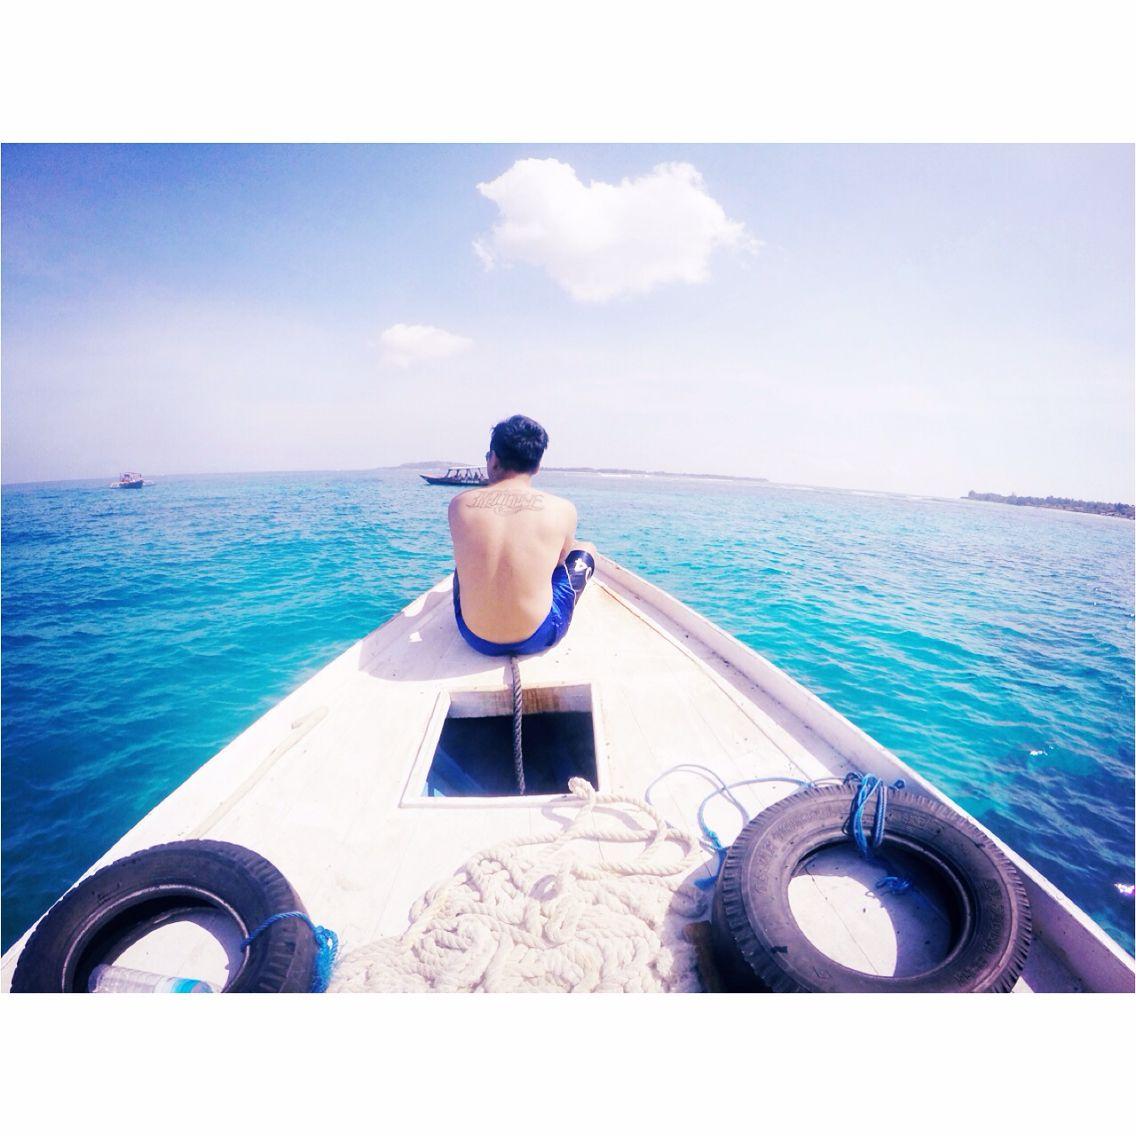 Vacation - gili trawangan, lombok, Indonesia